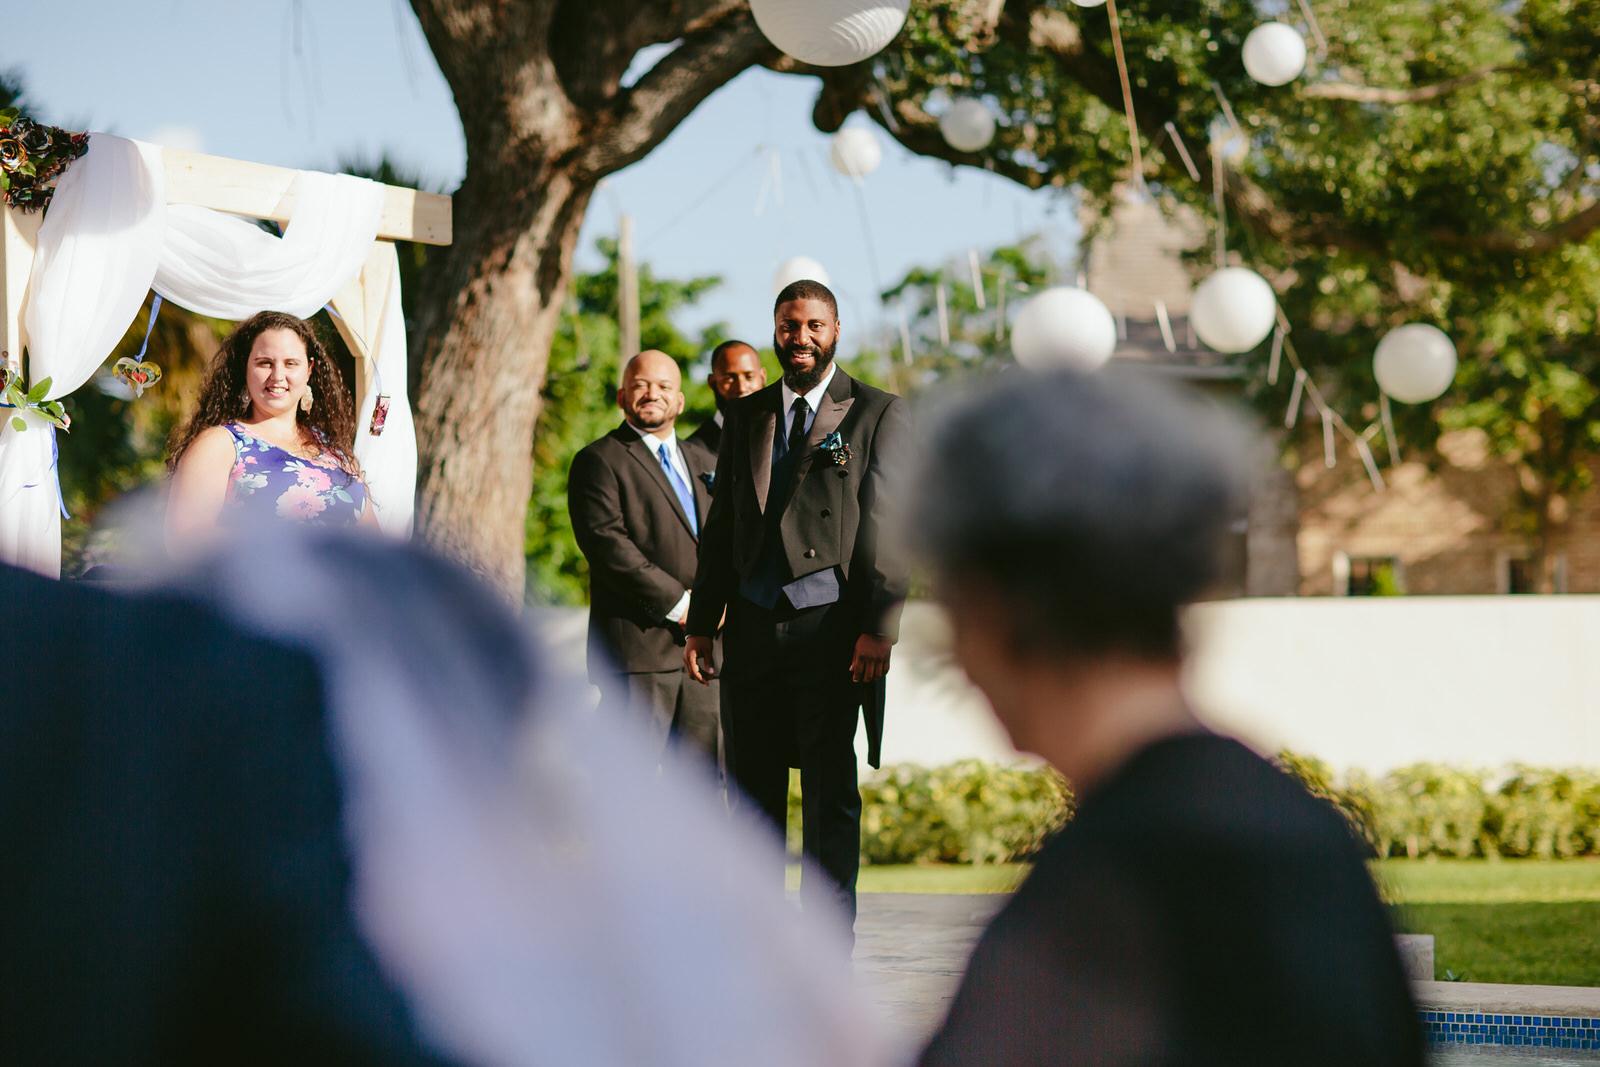 groom-first-look-ceremony-florida-backyard-wedding.jpg